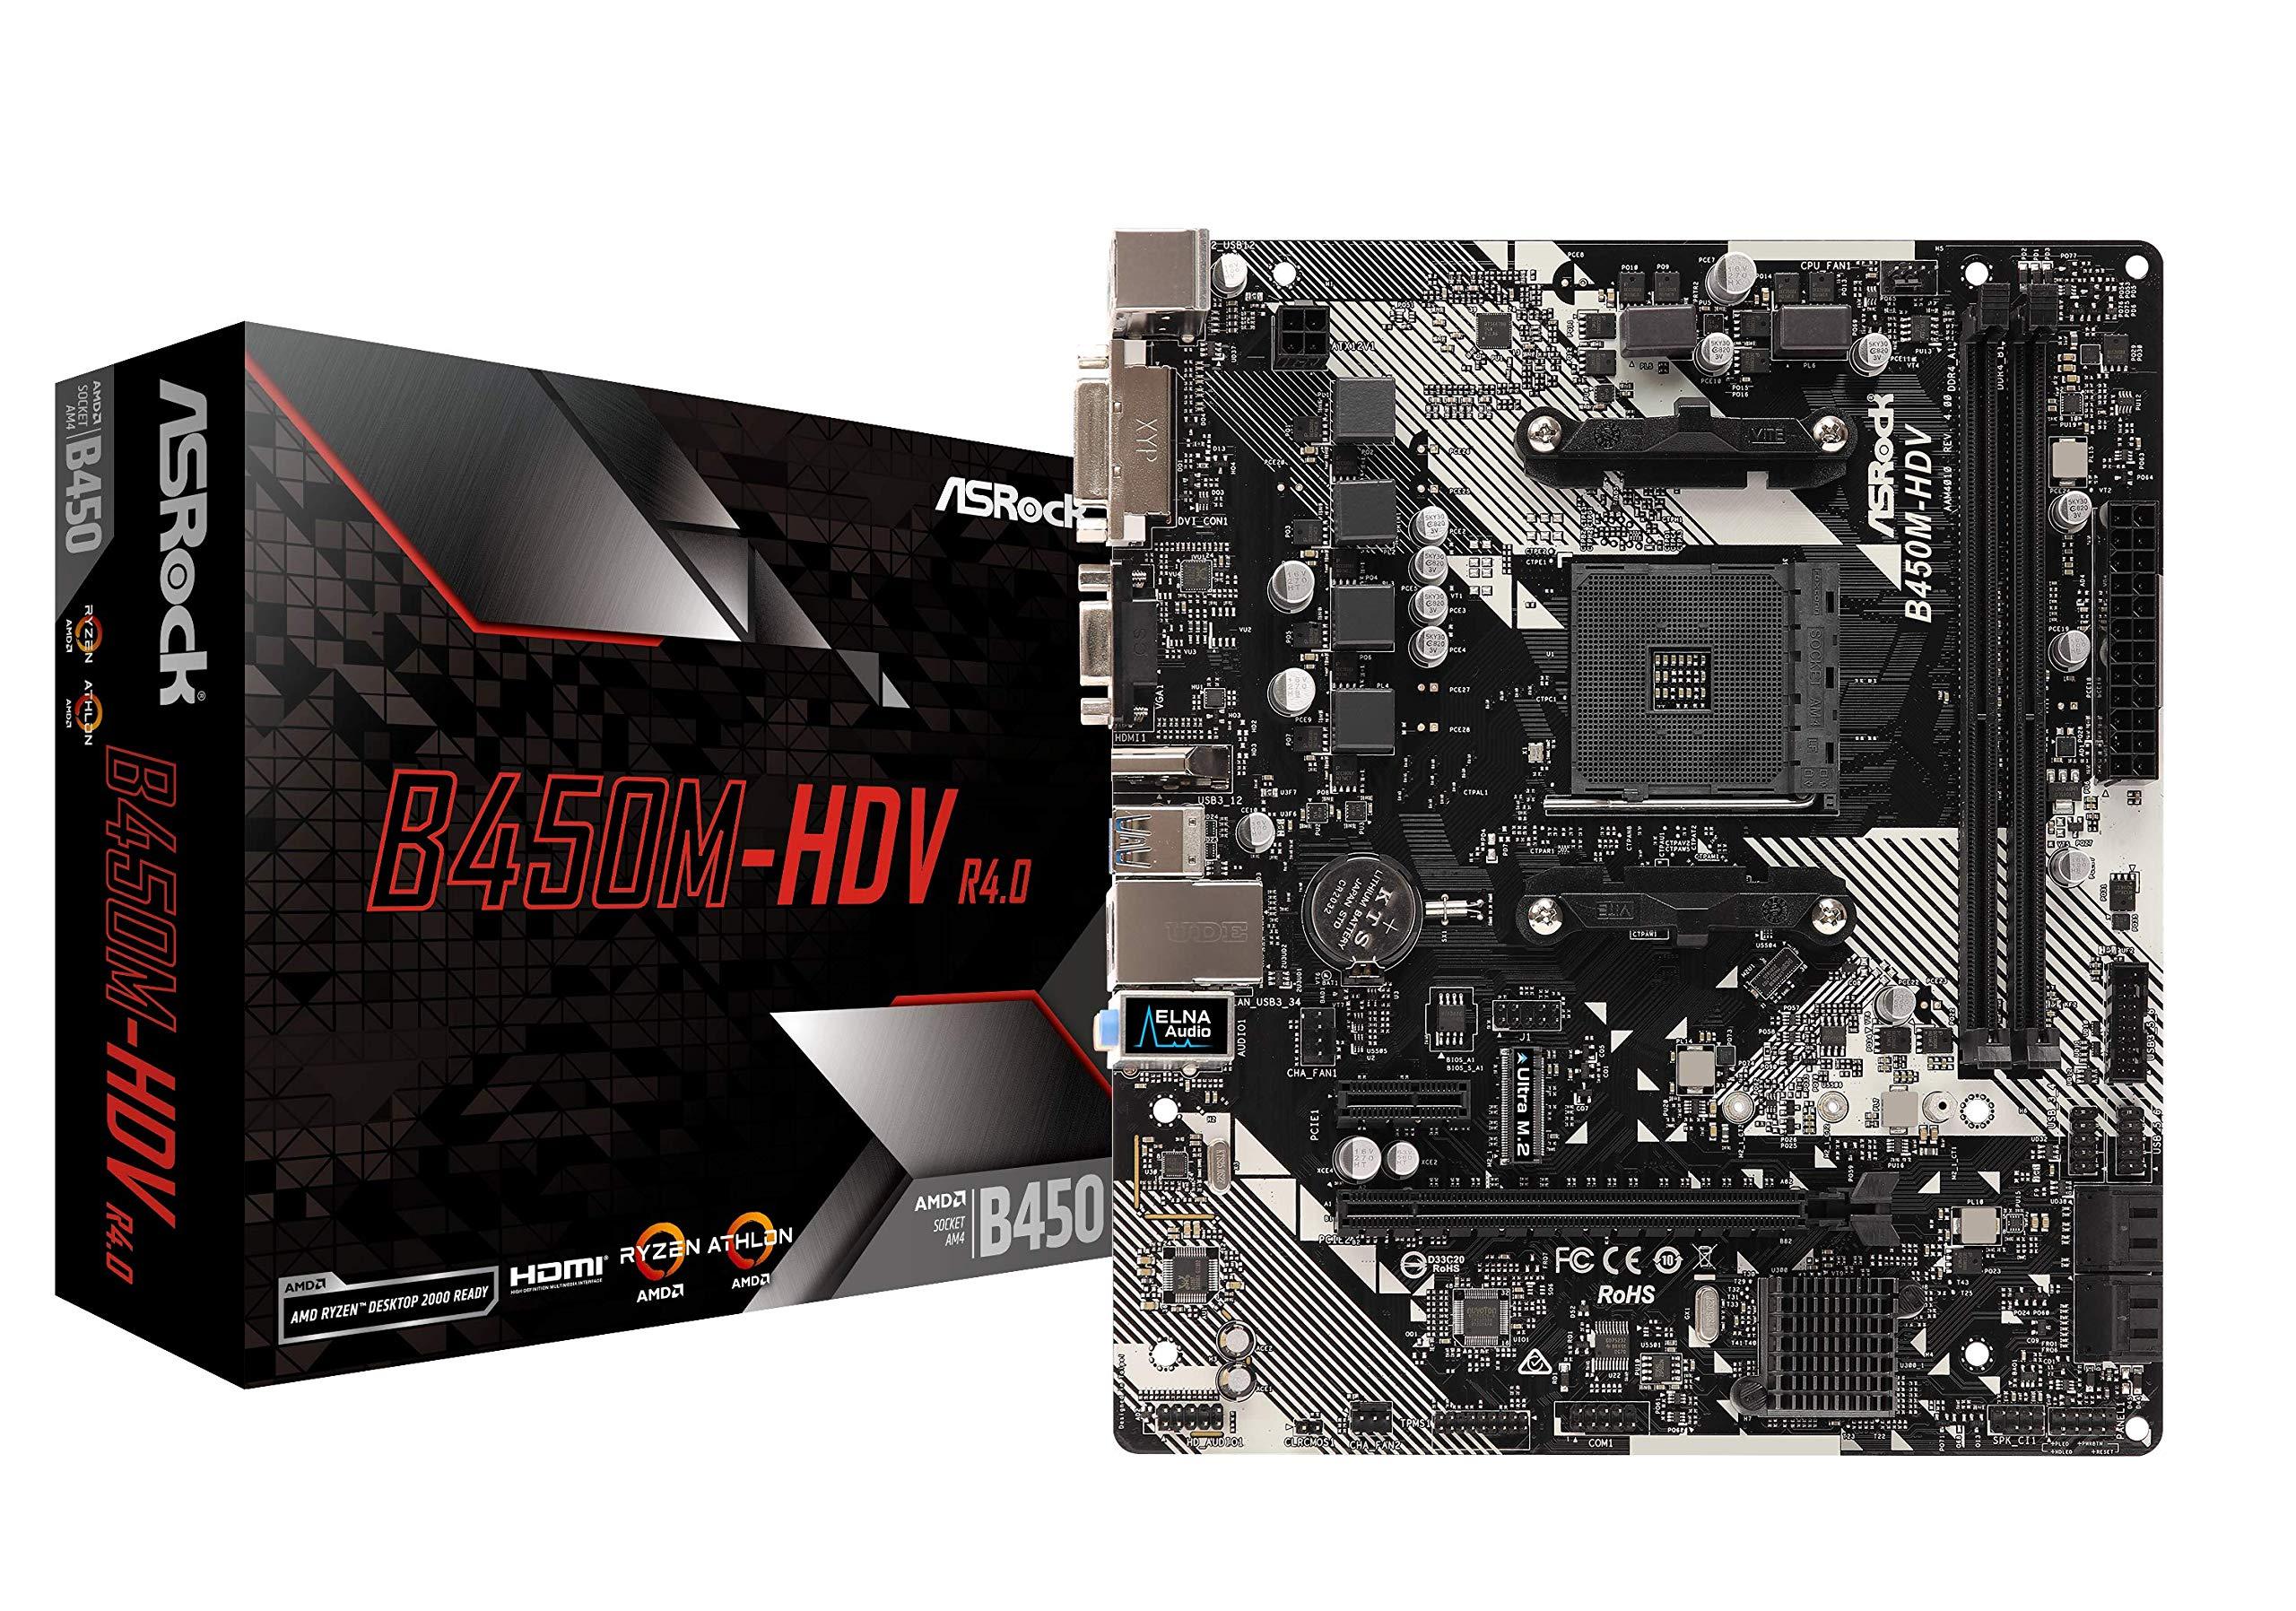 ASRock B450M-HDV R4.0 Socket AM4/ AMD Promontory B450/ DDR4/ SATA3&USB3.1/ M.2/ A&GbE/MicroATX Motherboard by ASRock